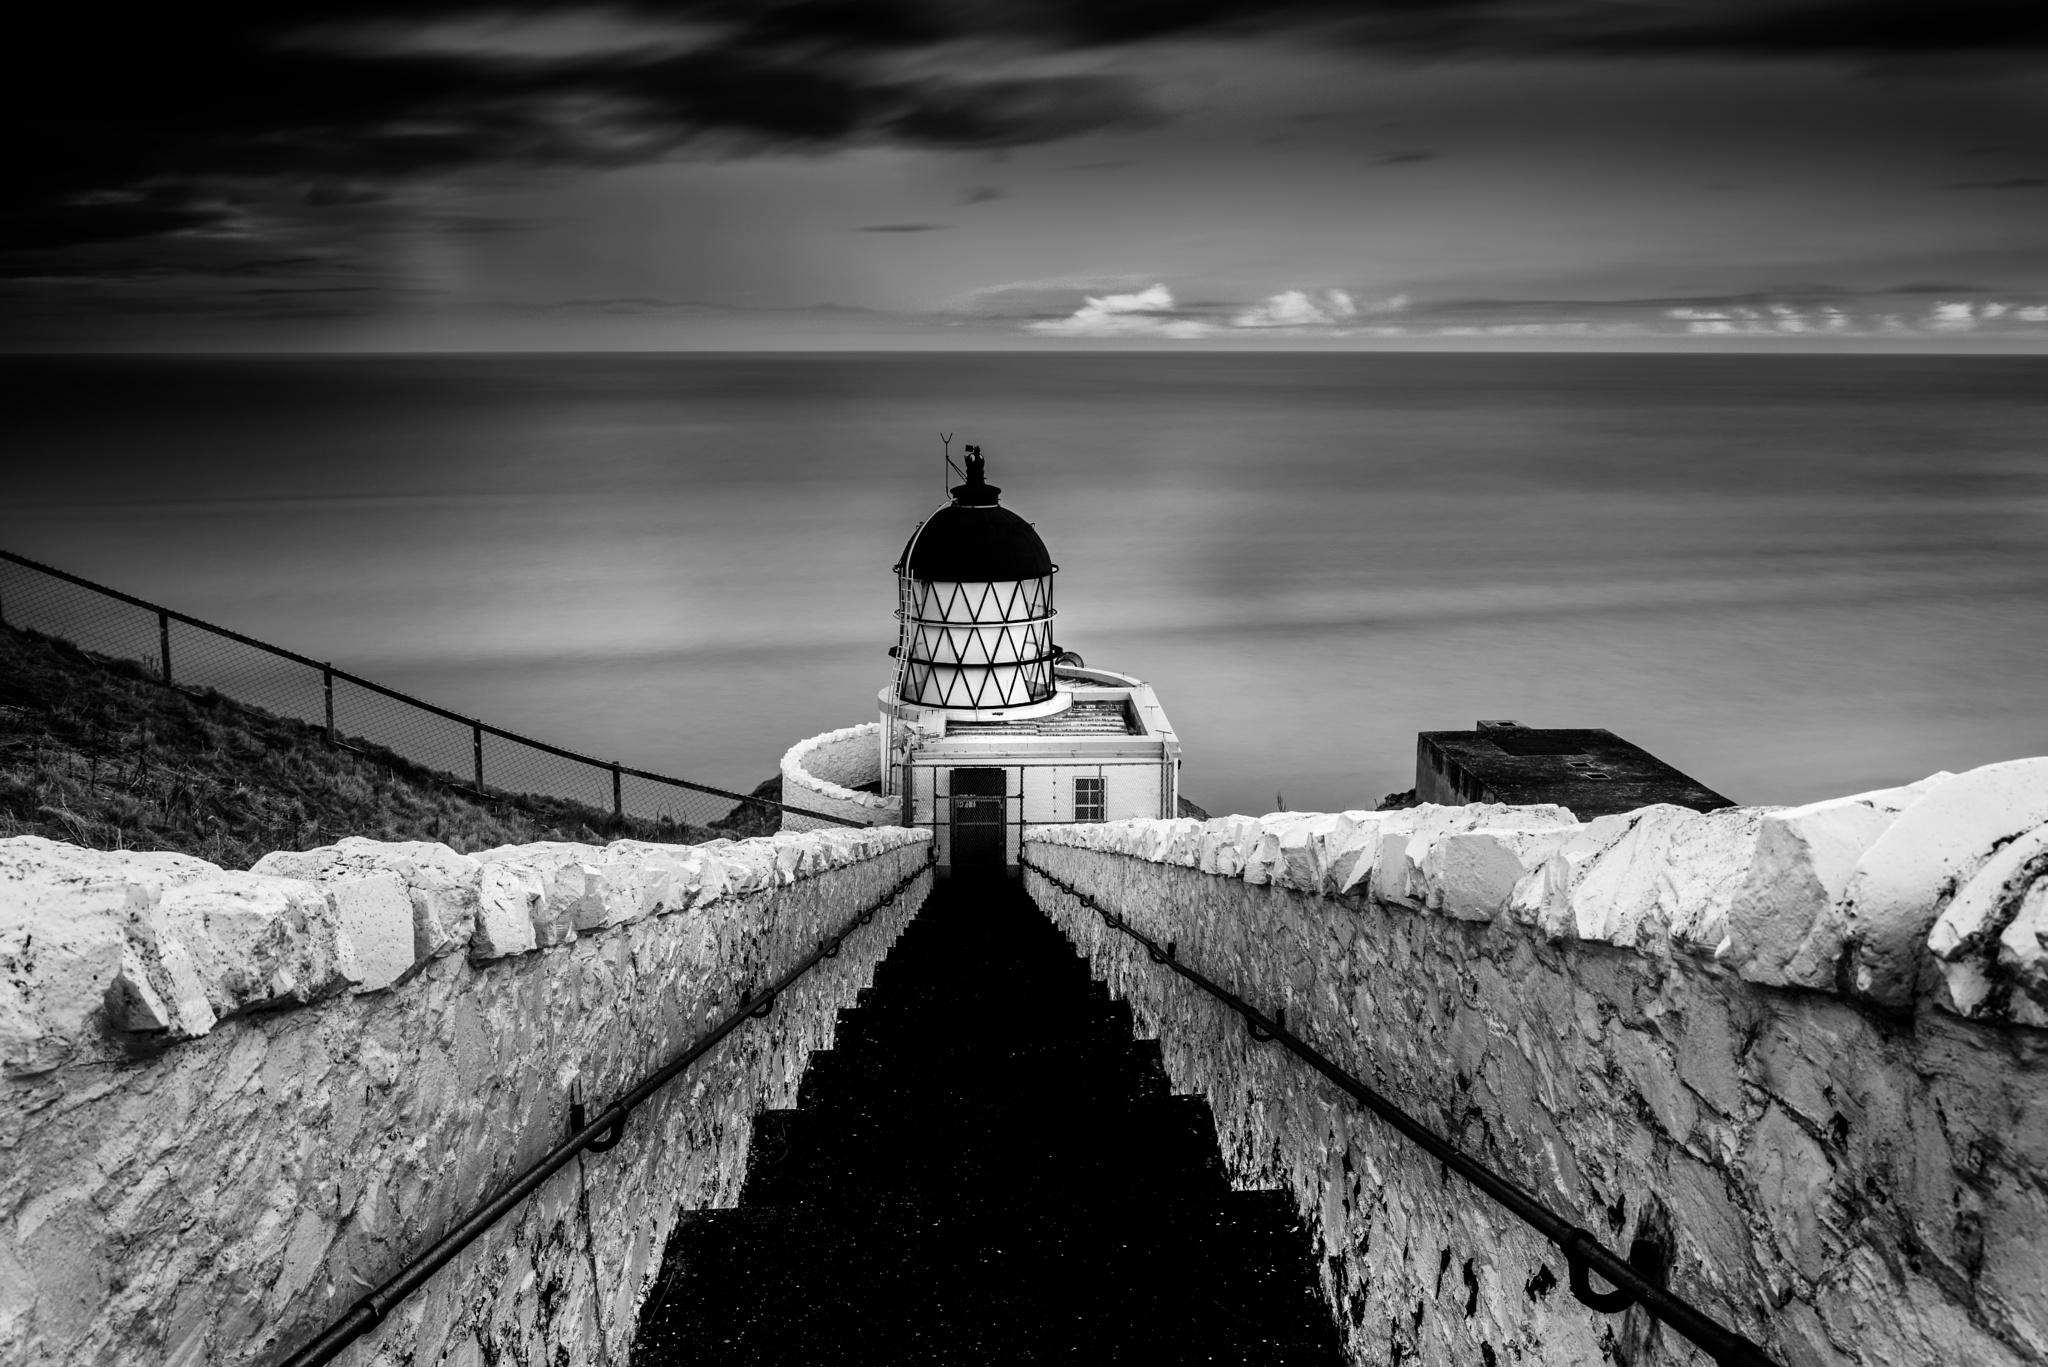 St Abbs Lighthouse by Martin Devlin